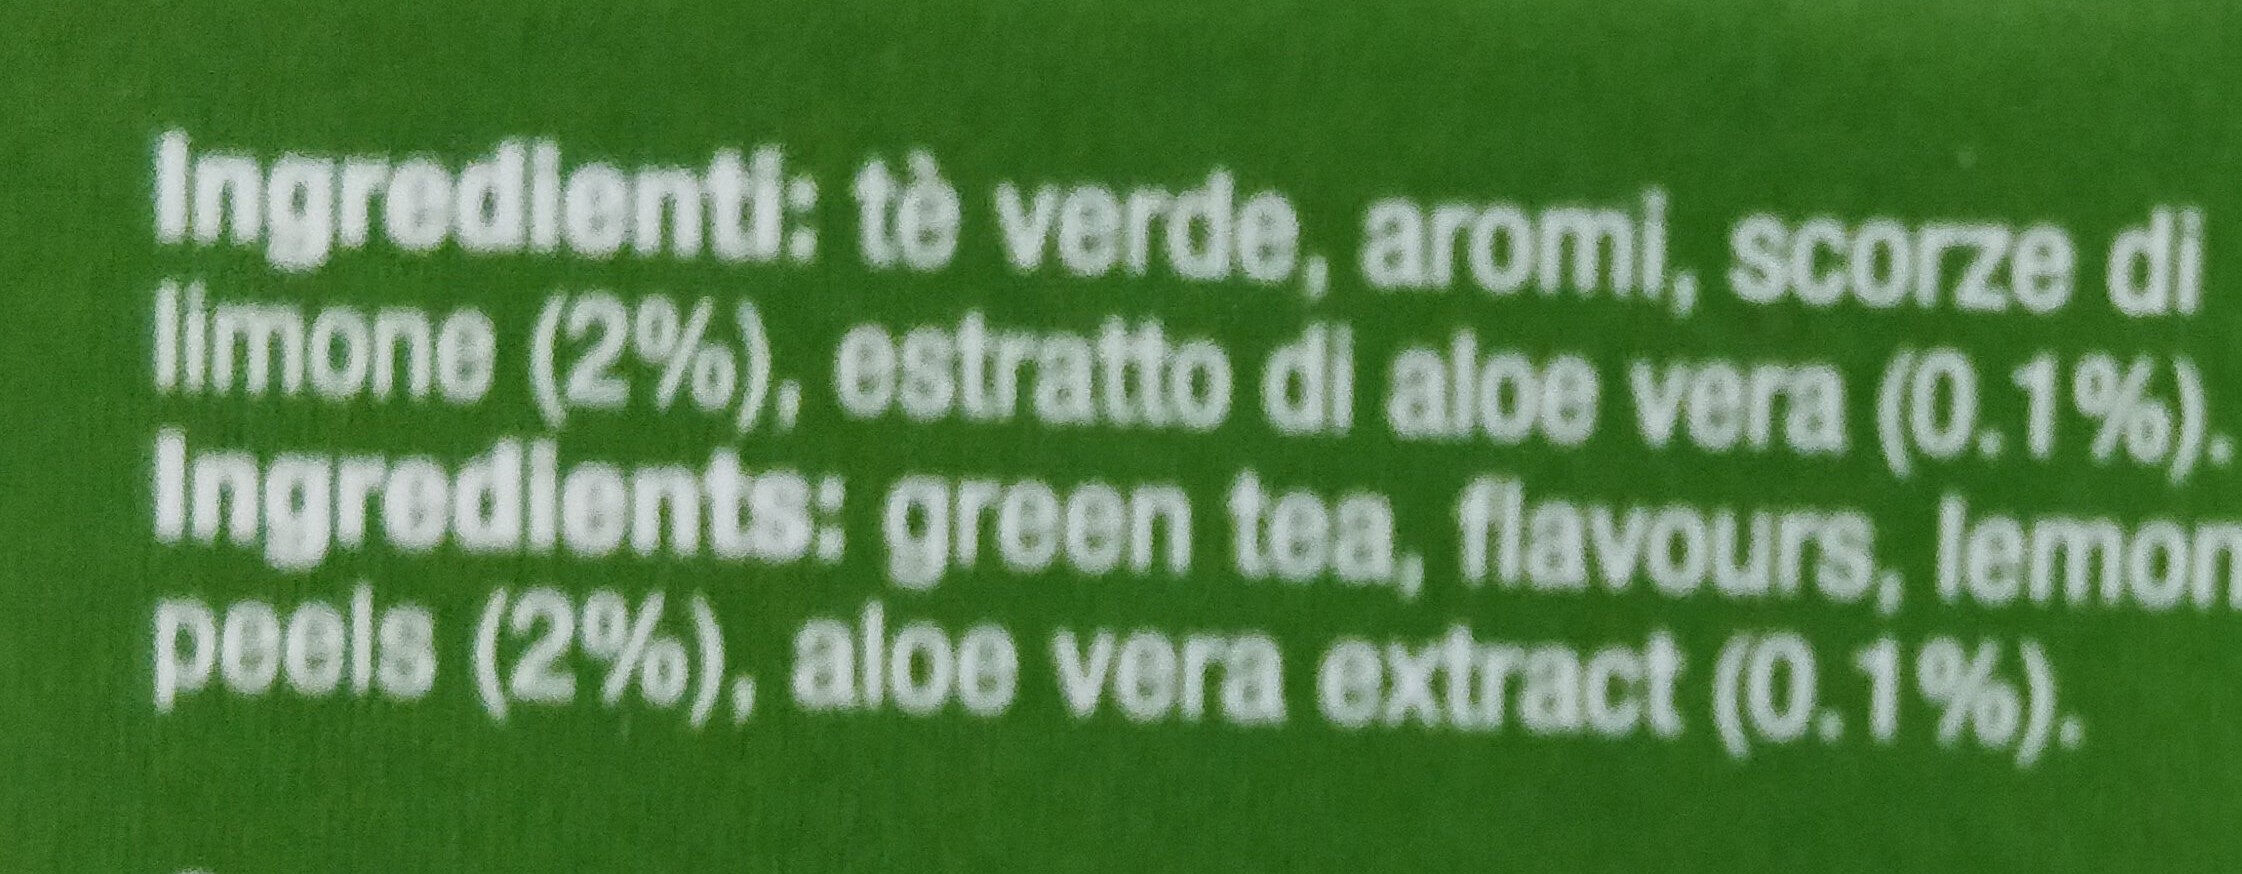 Tea cube - Ingredients - it